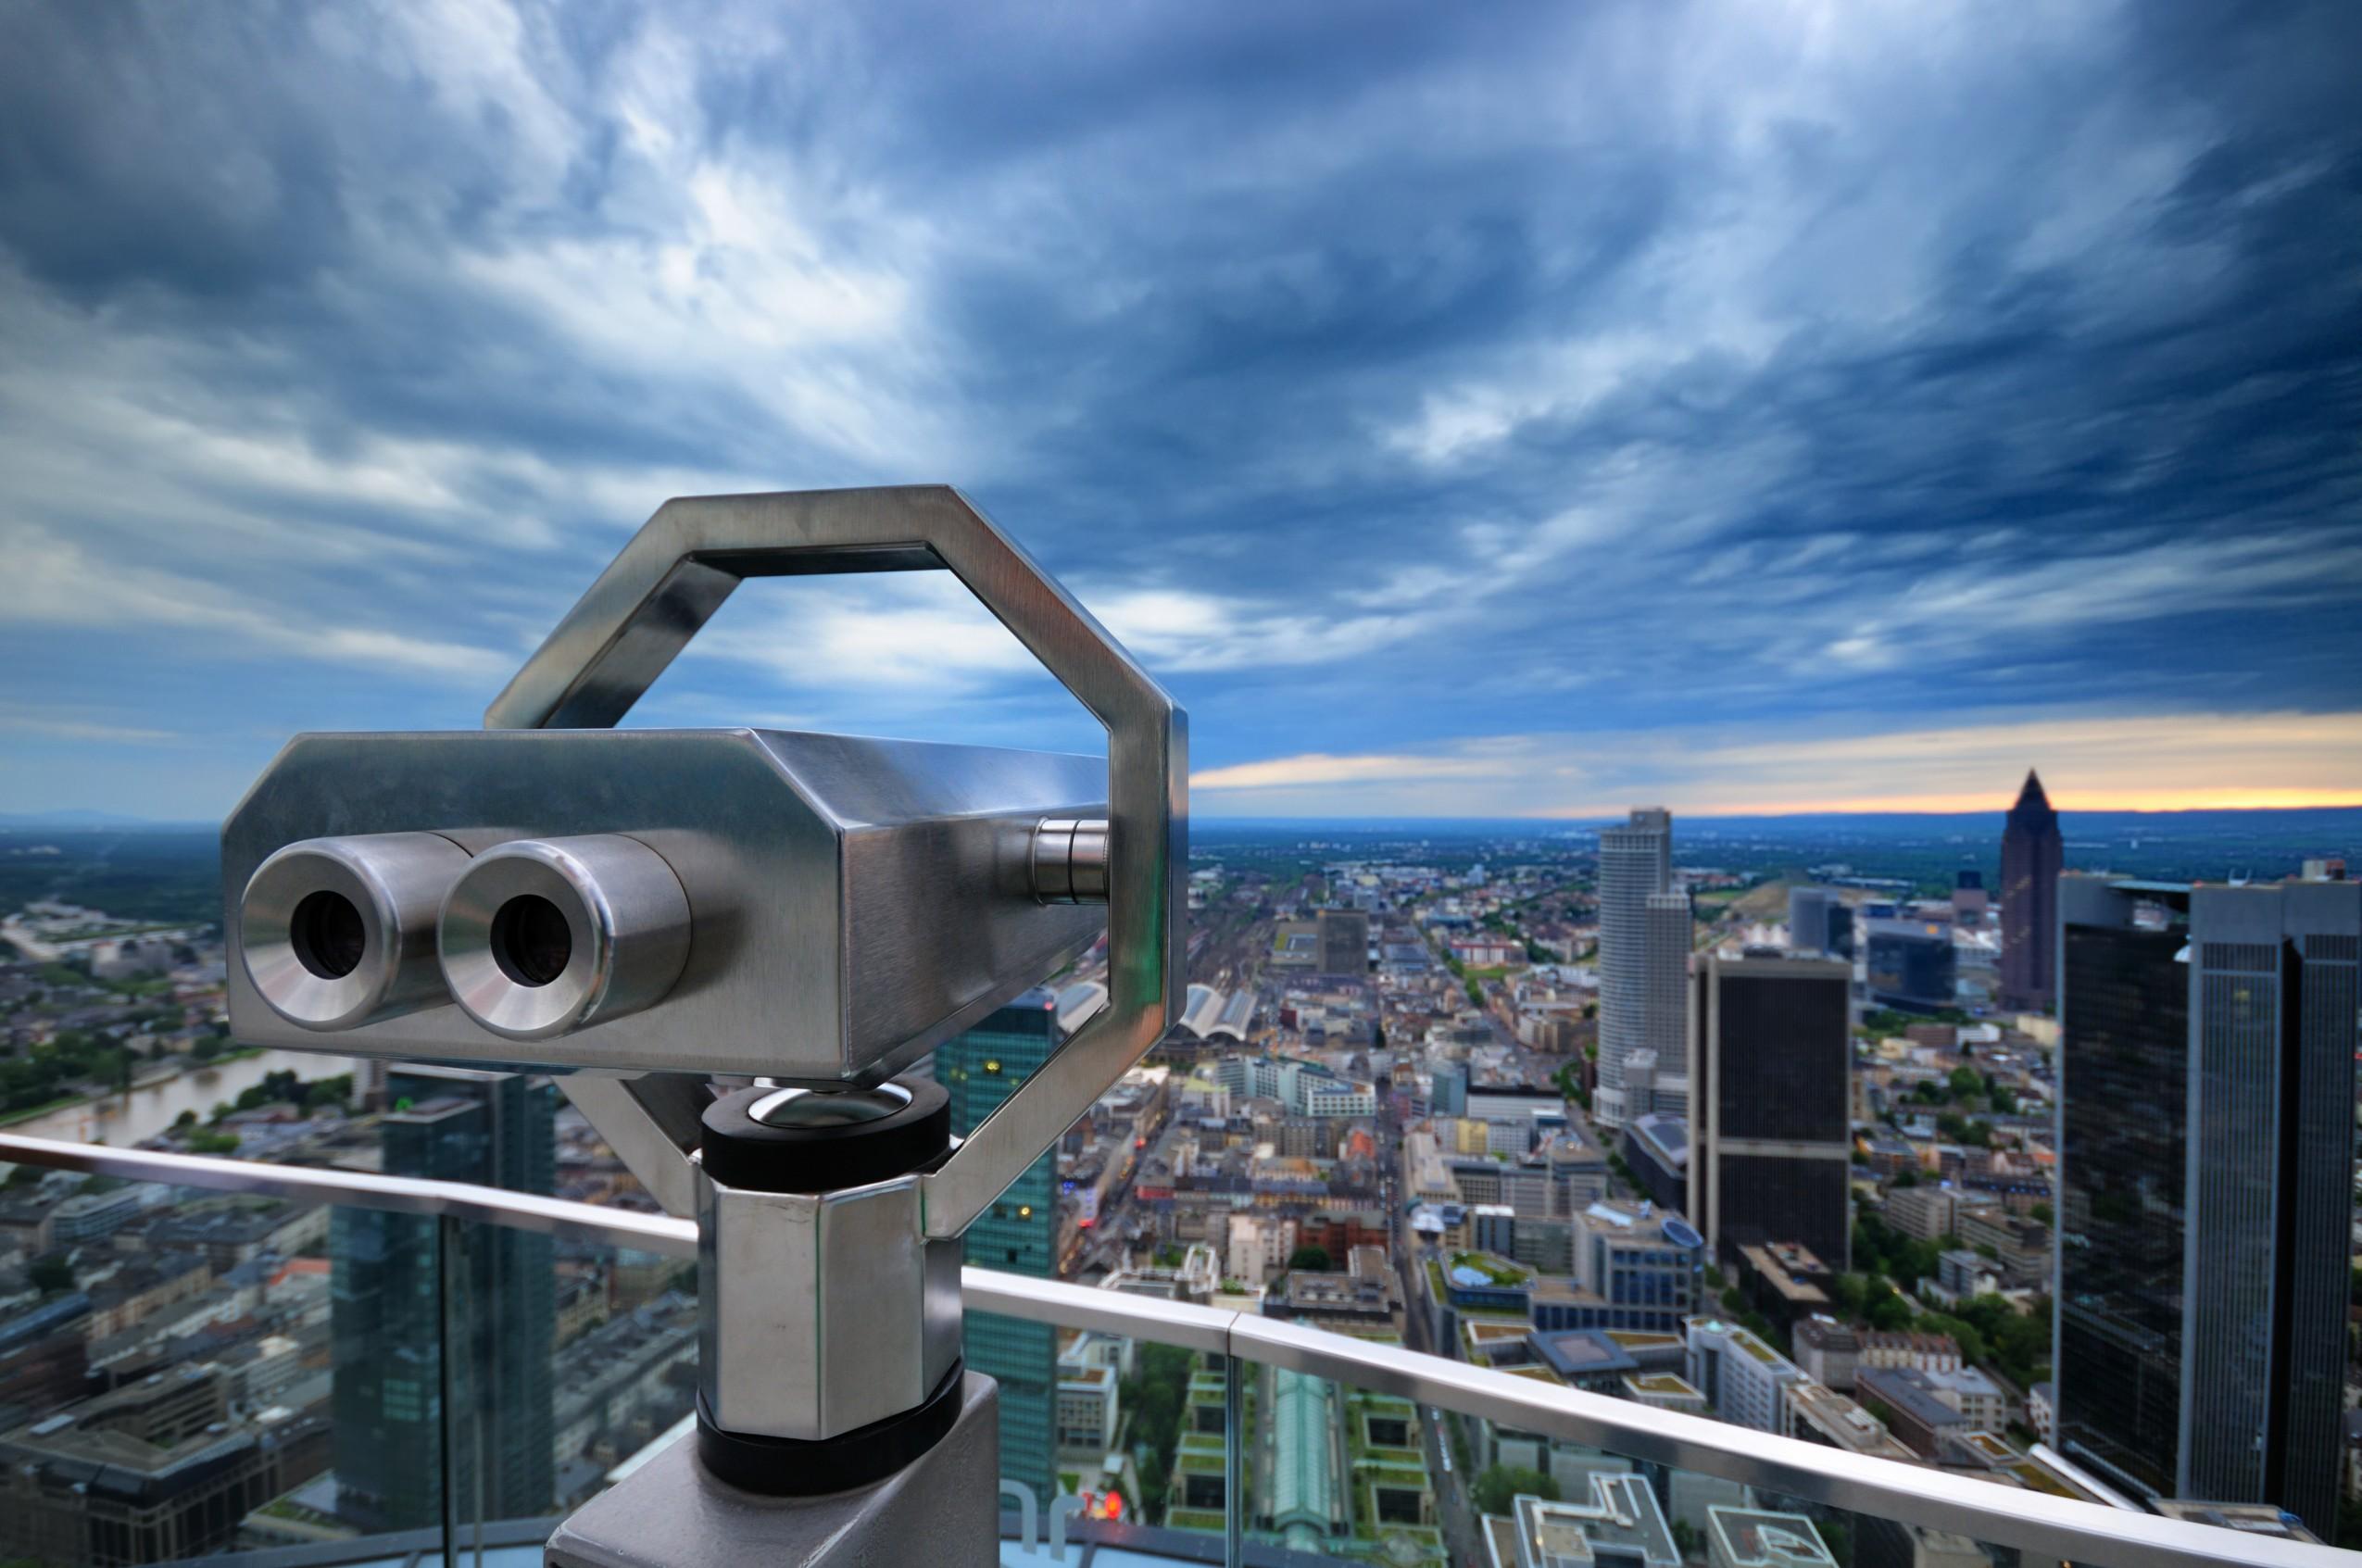 Observation Binoculars overlooking Frankfurt city